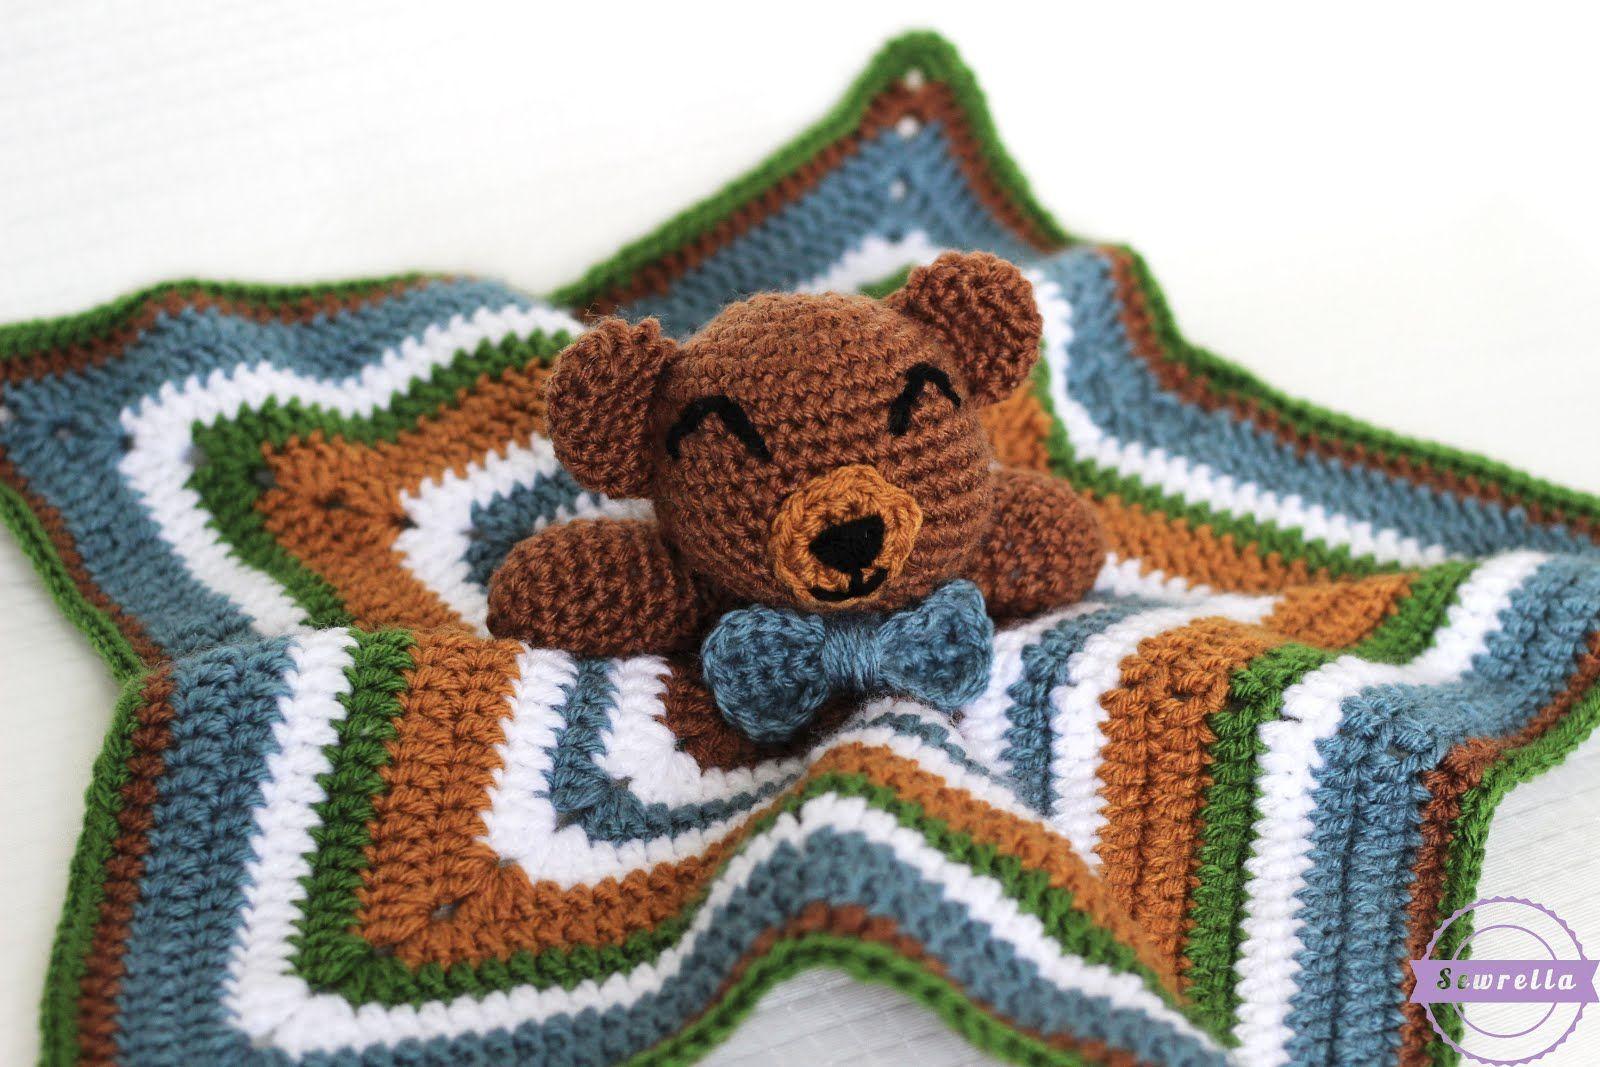 Sewrella: The Cuddliest Crochet Bear Lovey